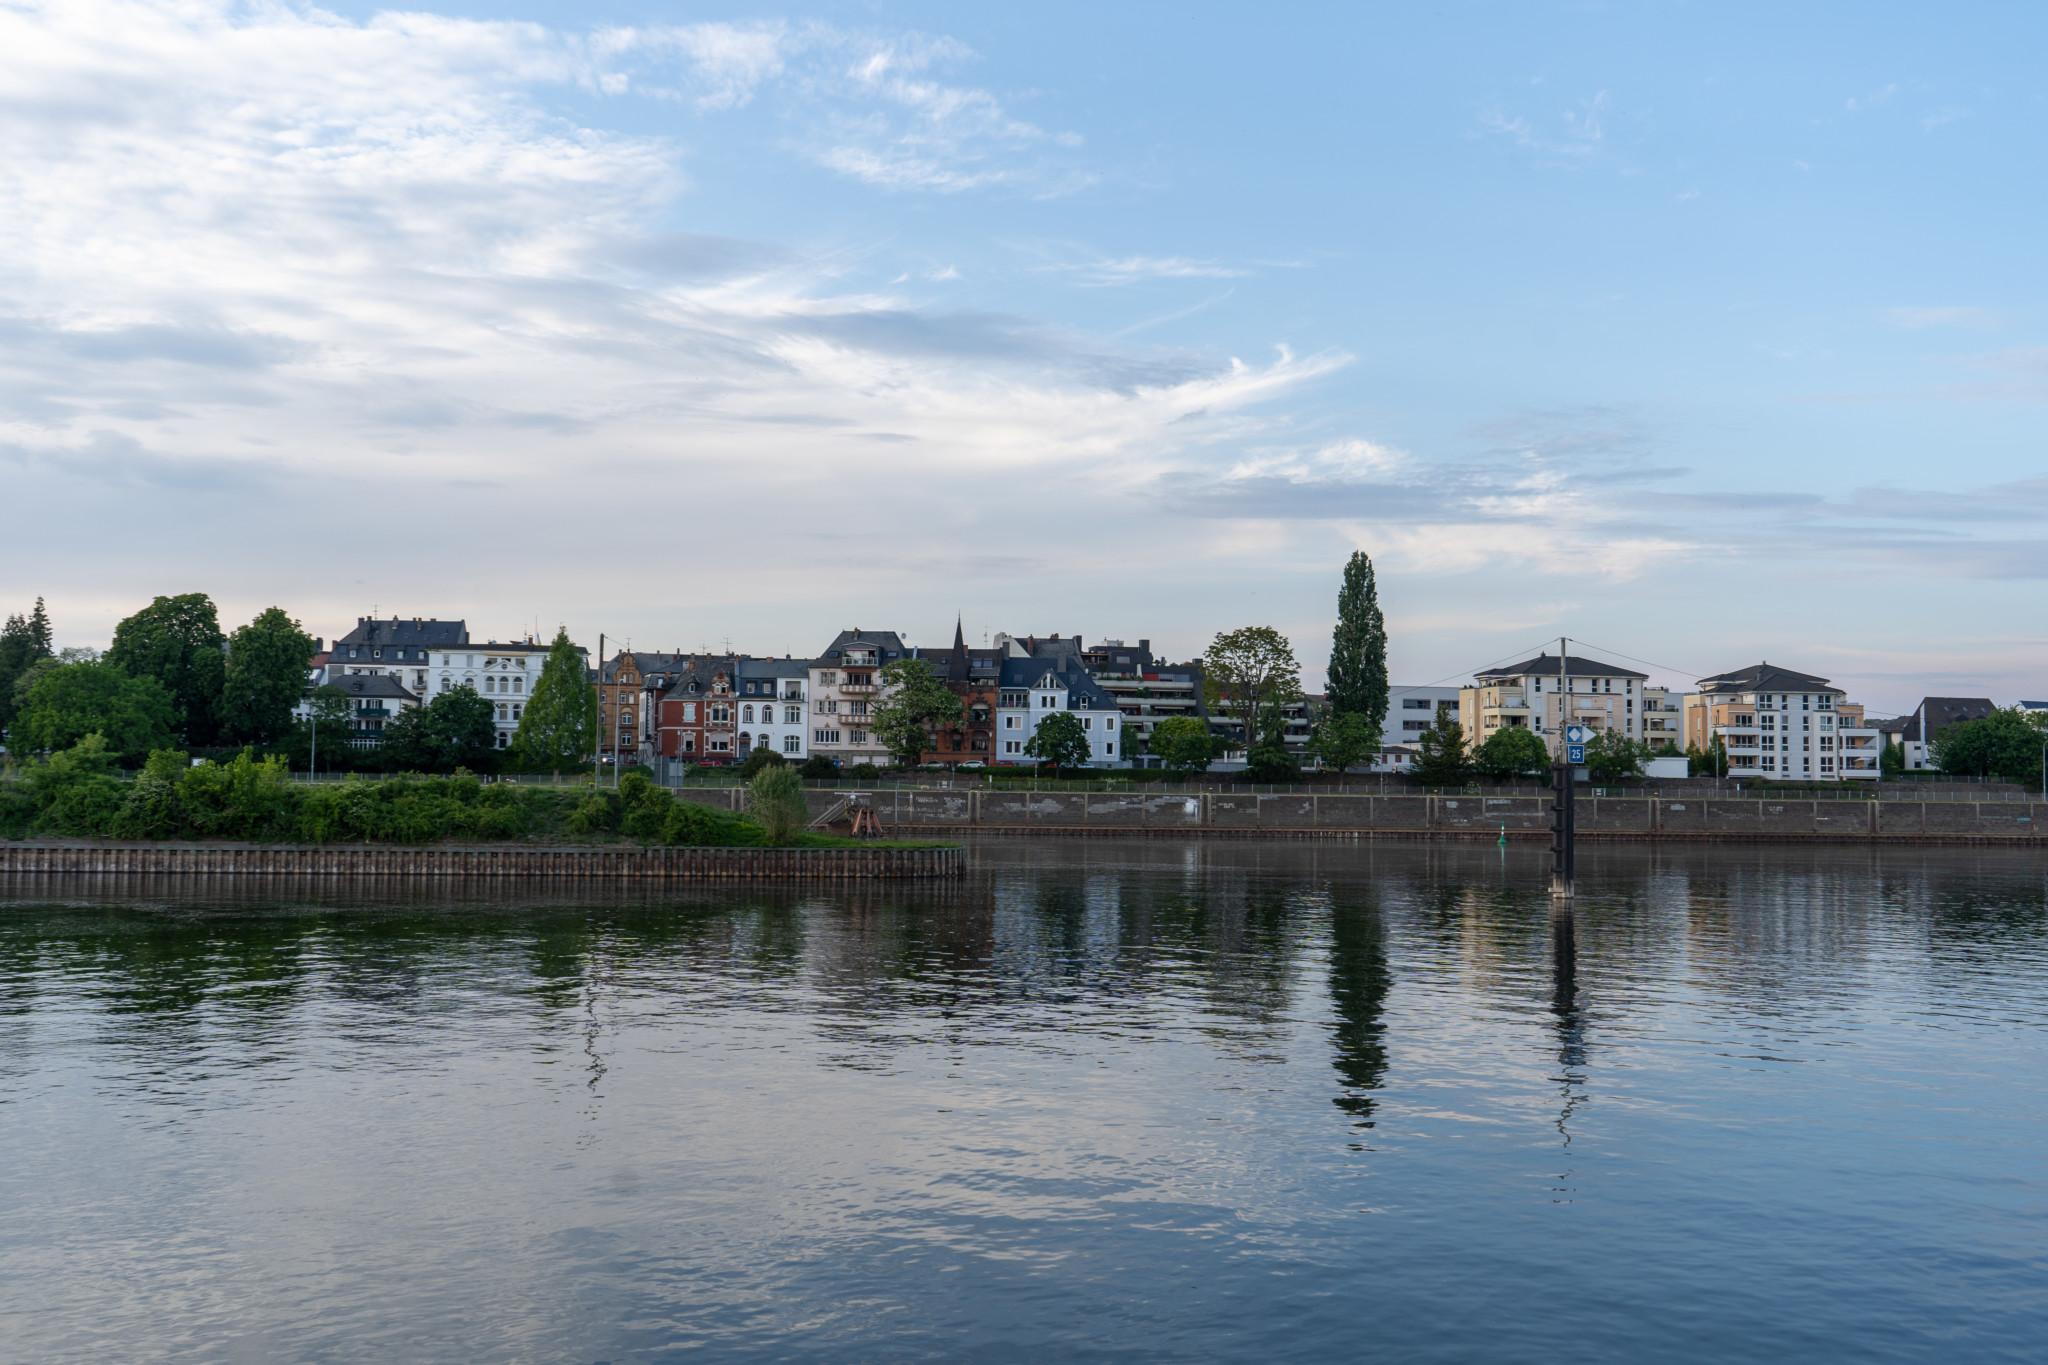 Mosel Ufer